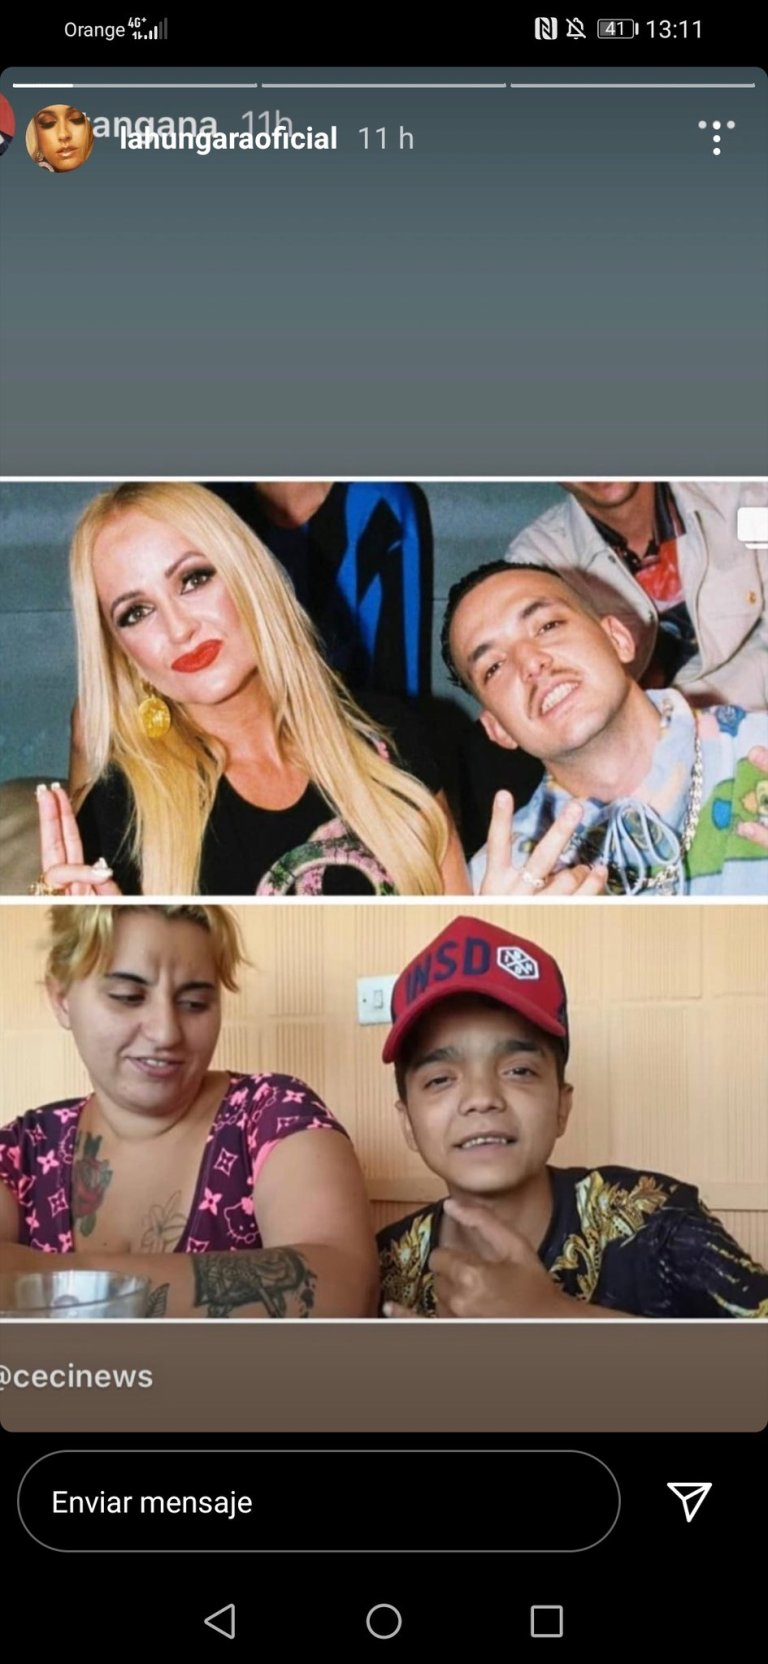 La Húngara troliando a CTangana en Instagram